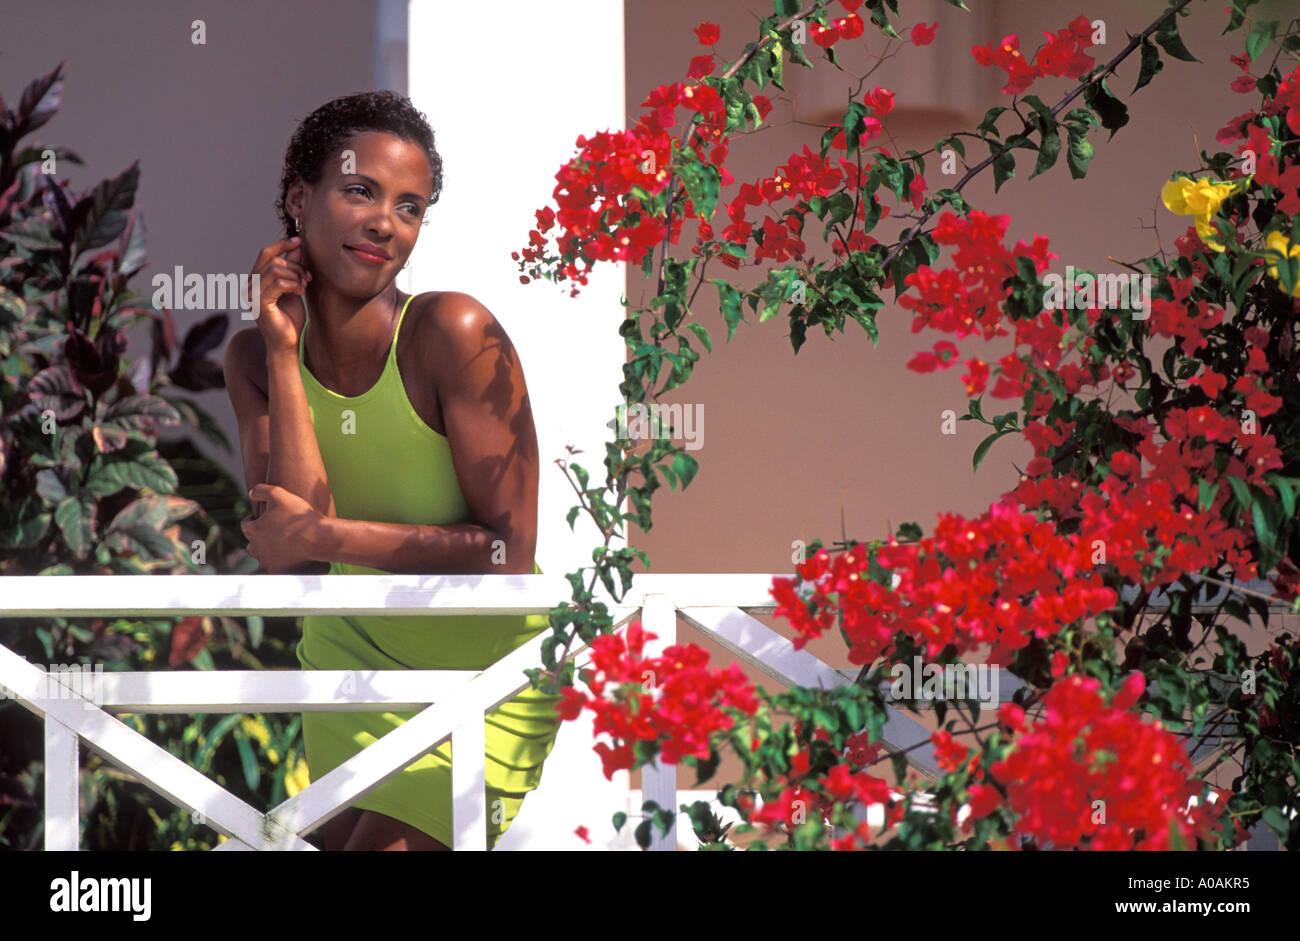 Reflective Caribbean: Trinidad And Tobago Dress Stock Photos & Trinidad And